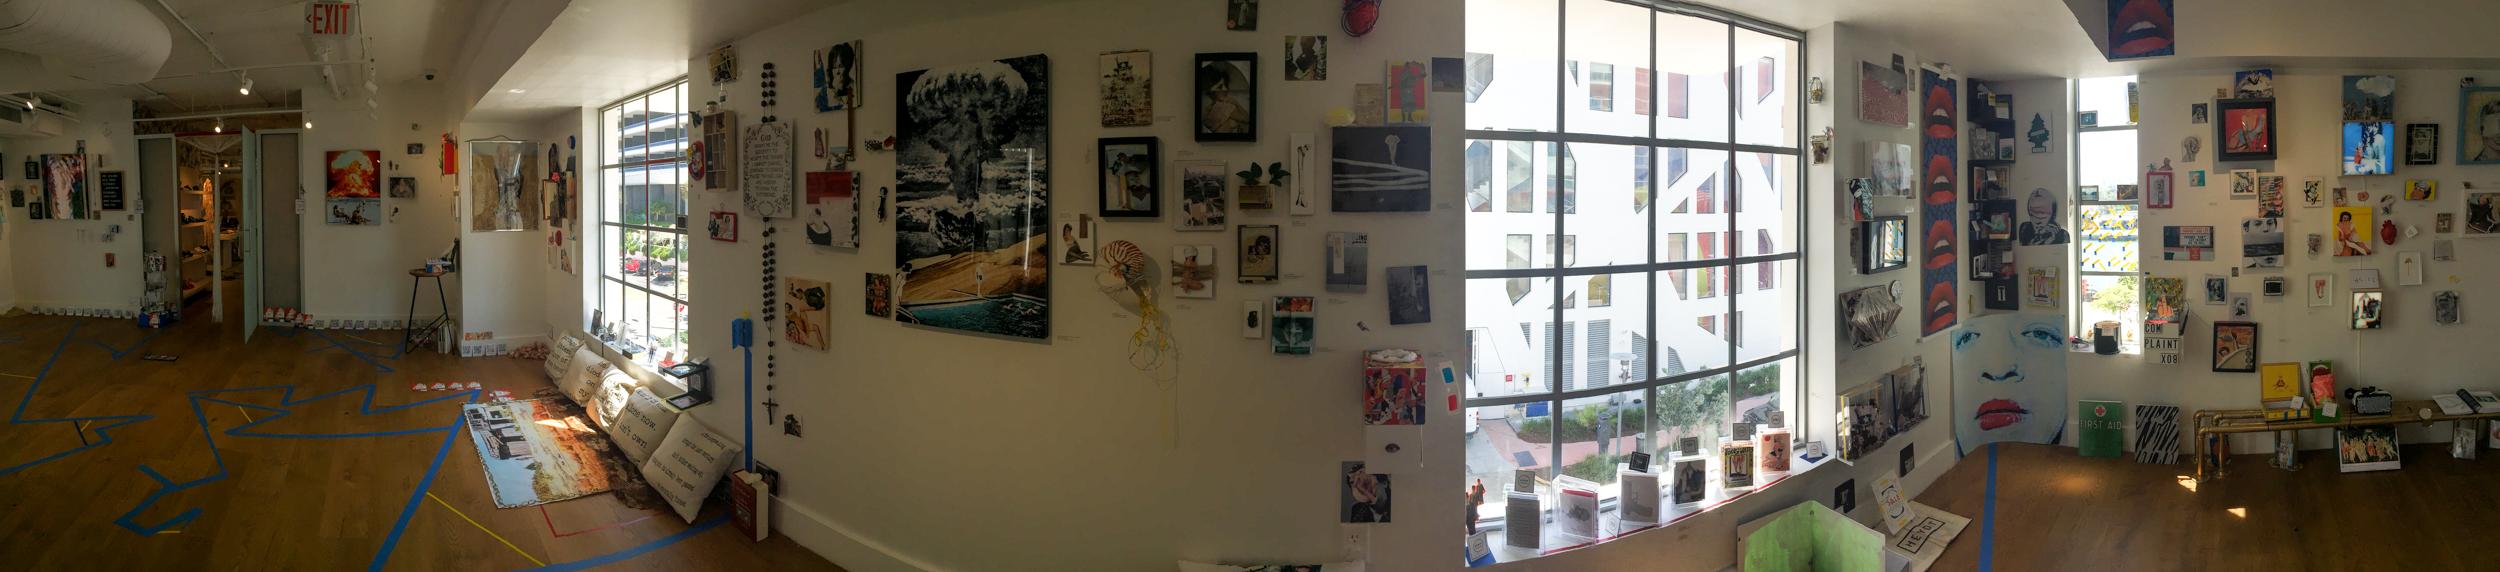 Faena-Exhibition-Images-122.jpg